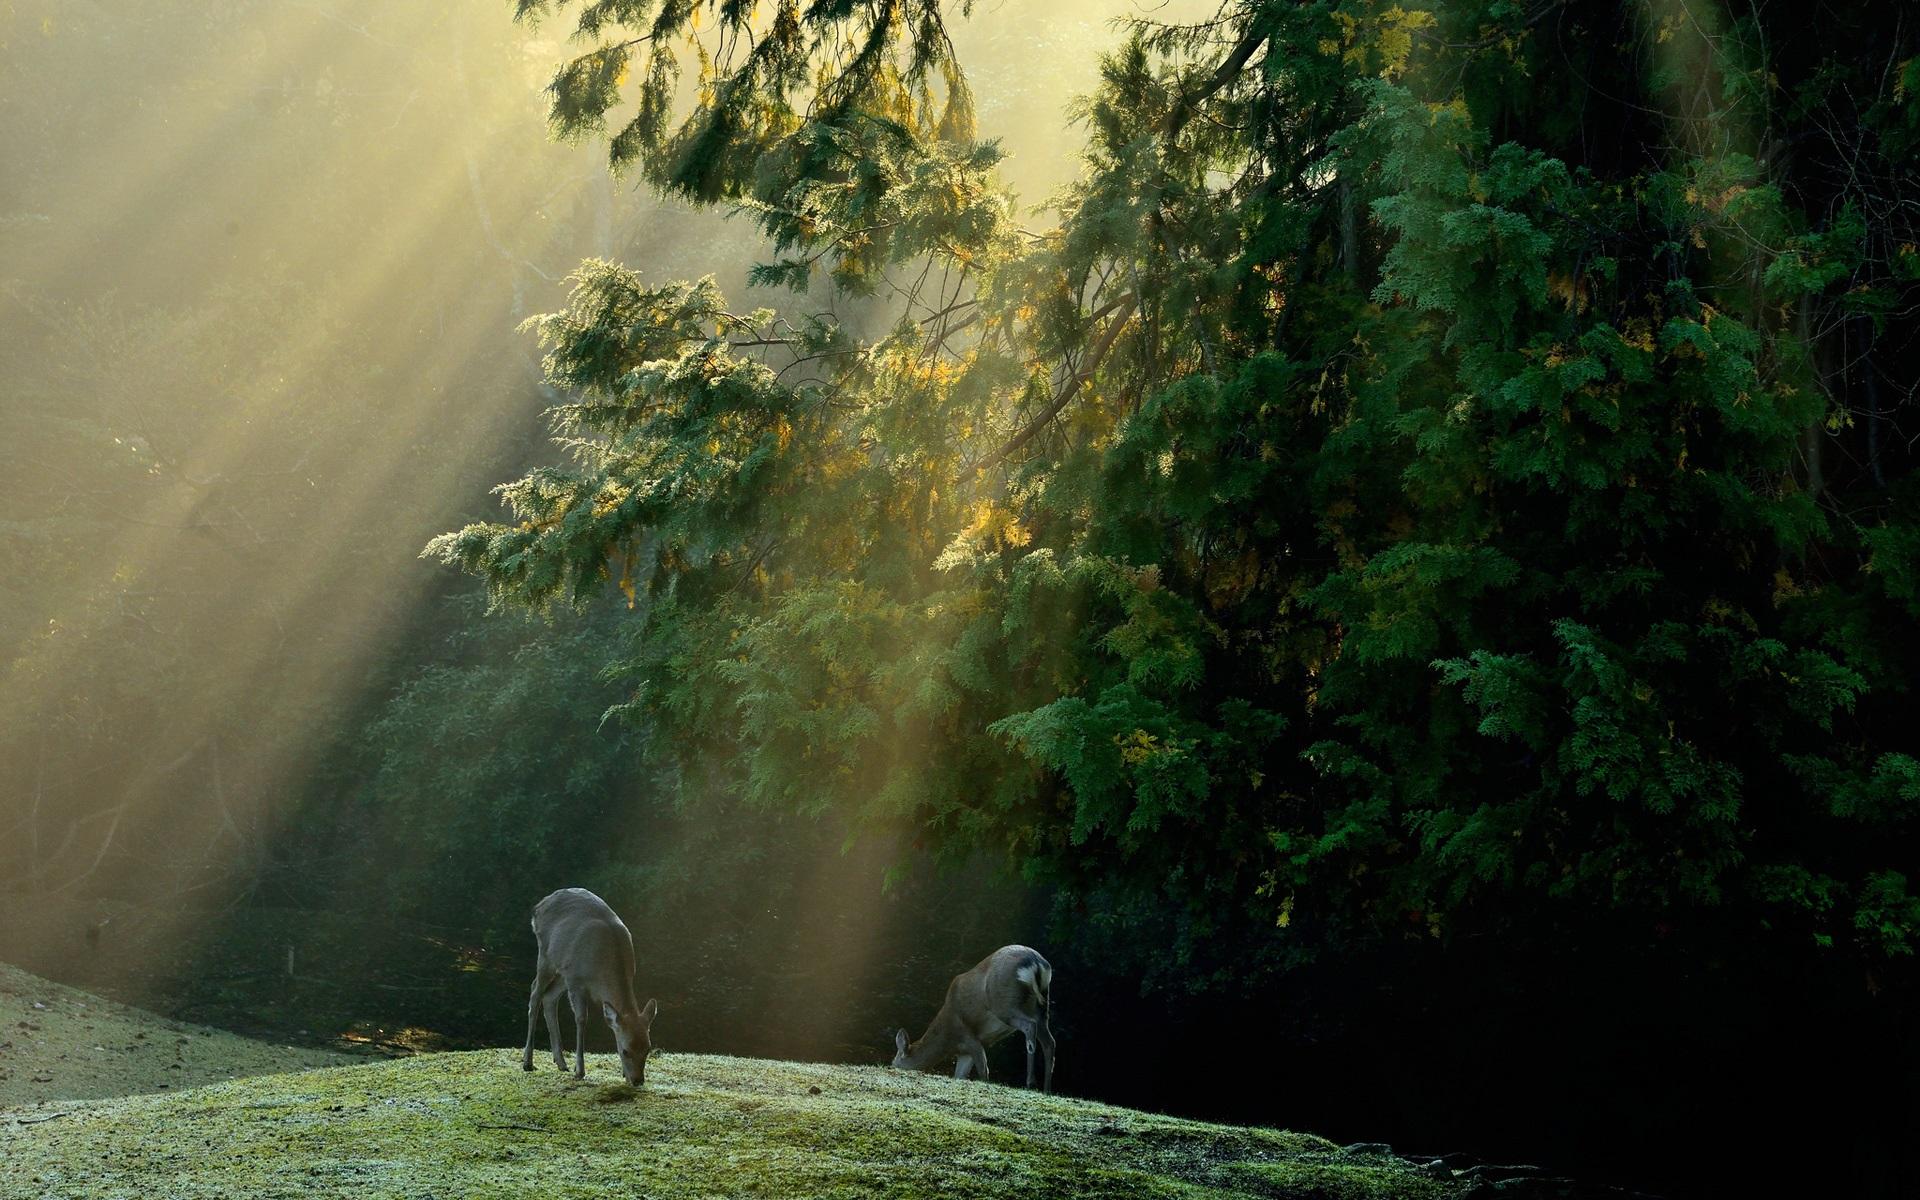 3d Apple Wallpaper Hd 1080p Download Forest Trees Meadow Deer Sun Rays Wallpaper Nature